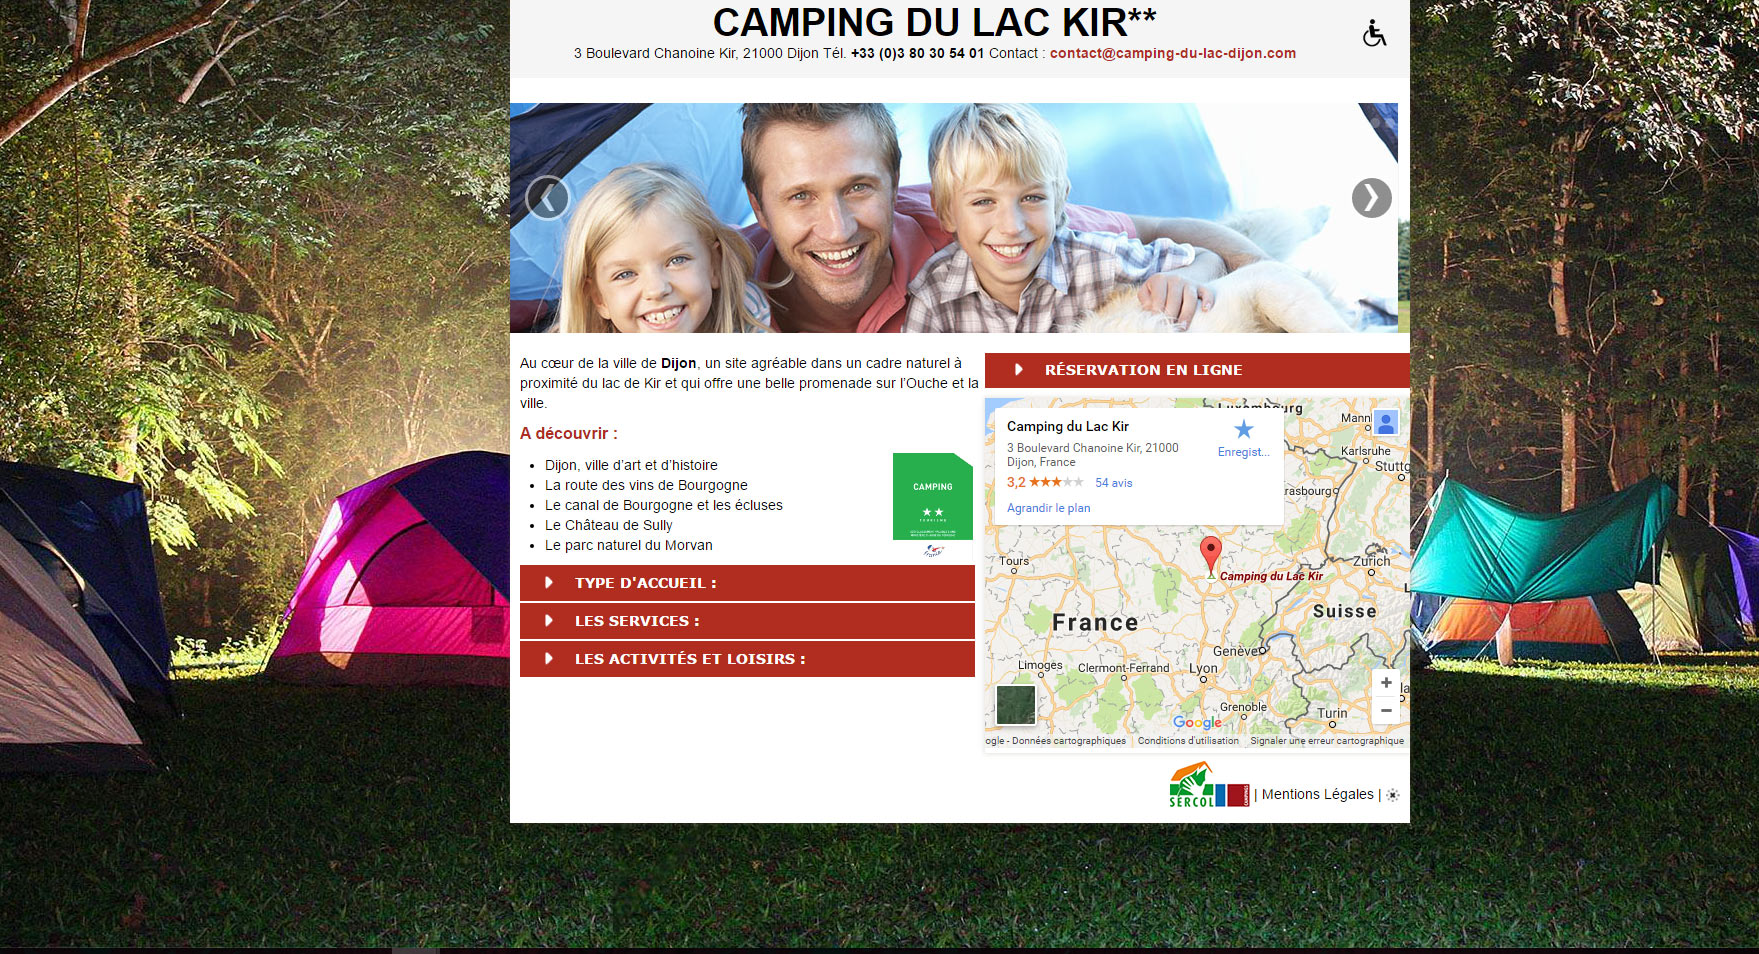 Camping-du-lac-kir-site-internet_home